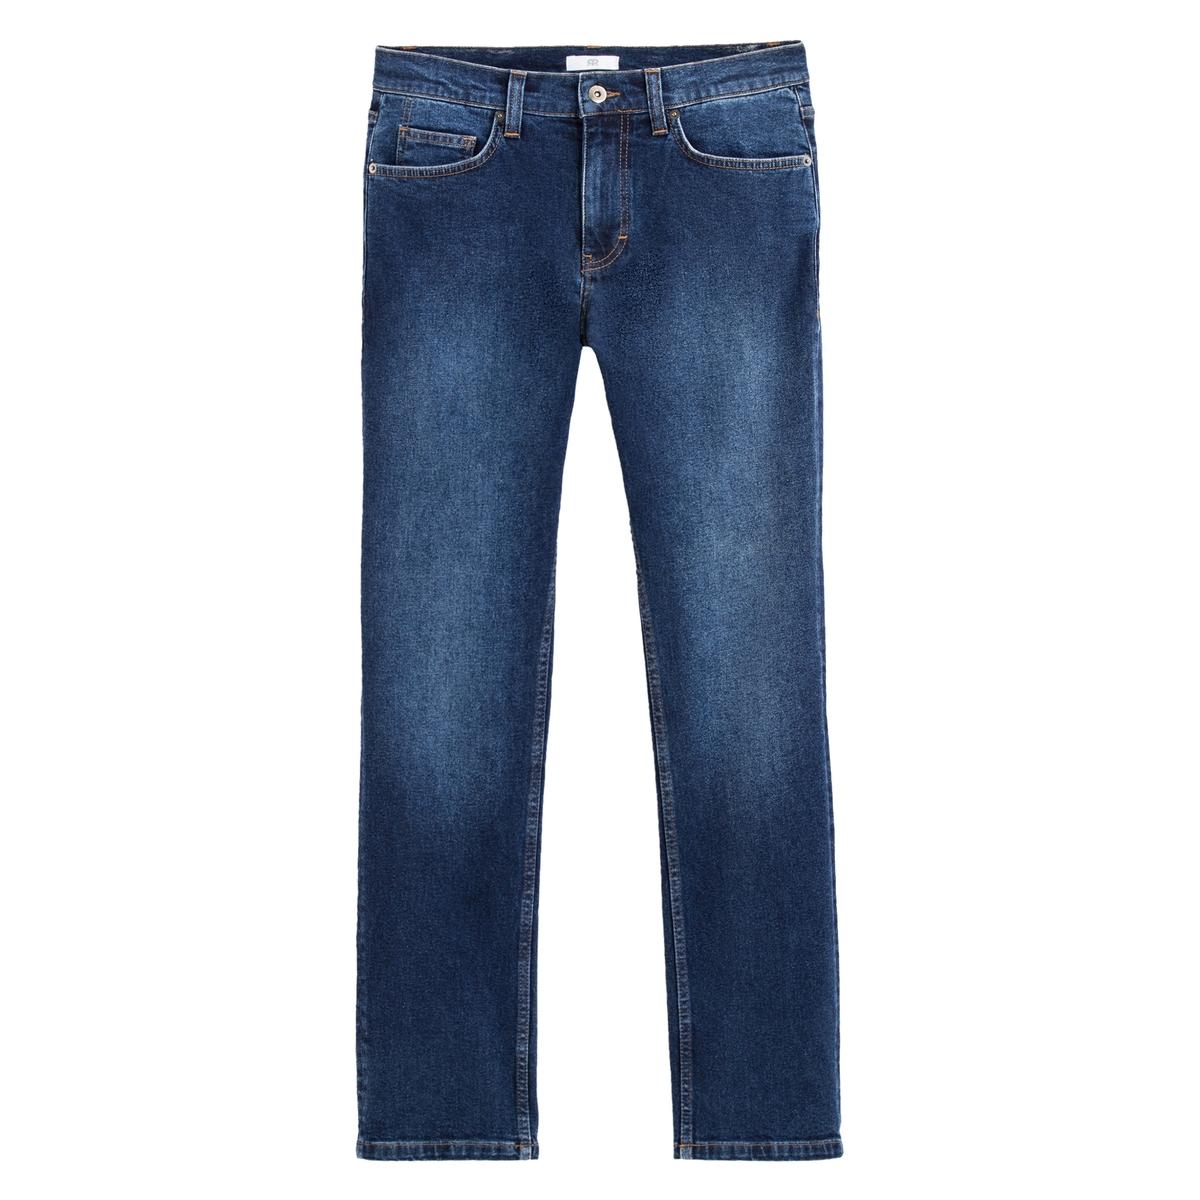 Jeans regular, matéria reciclada